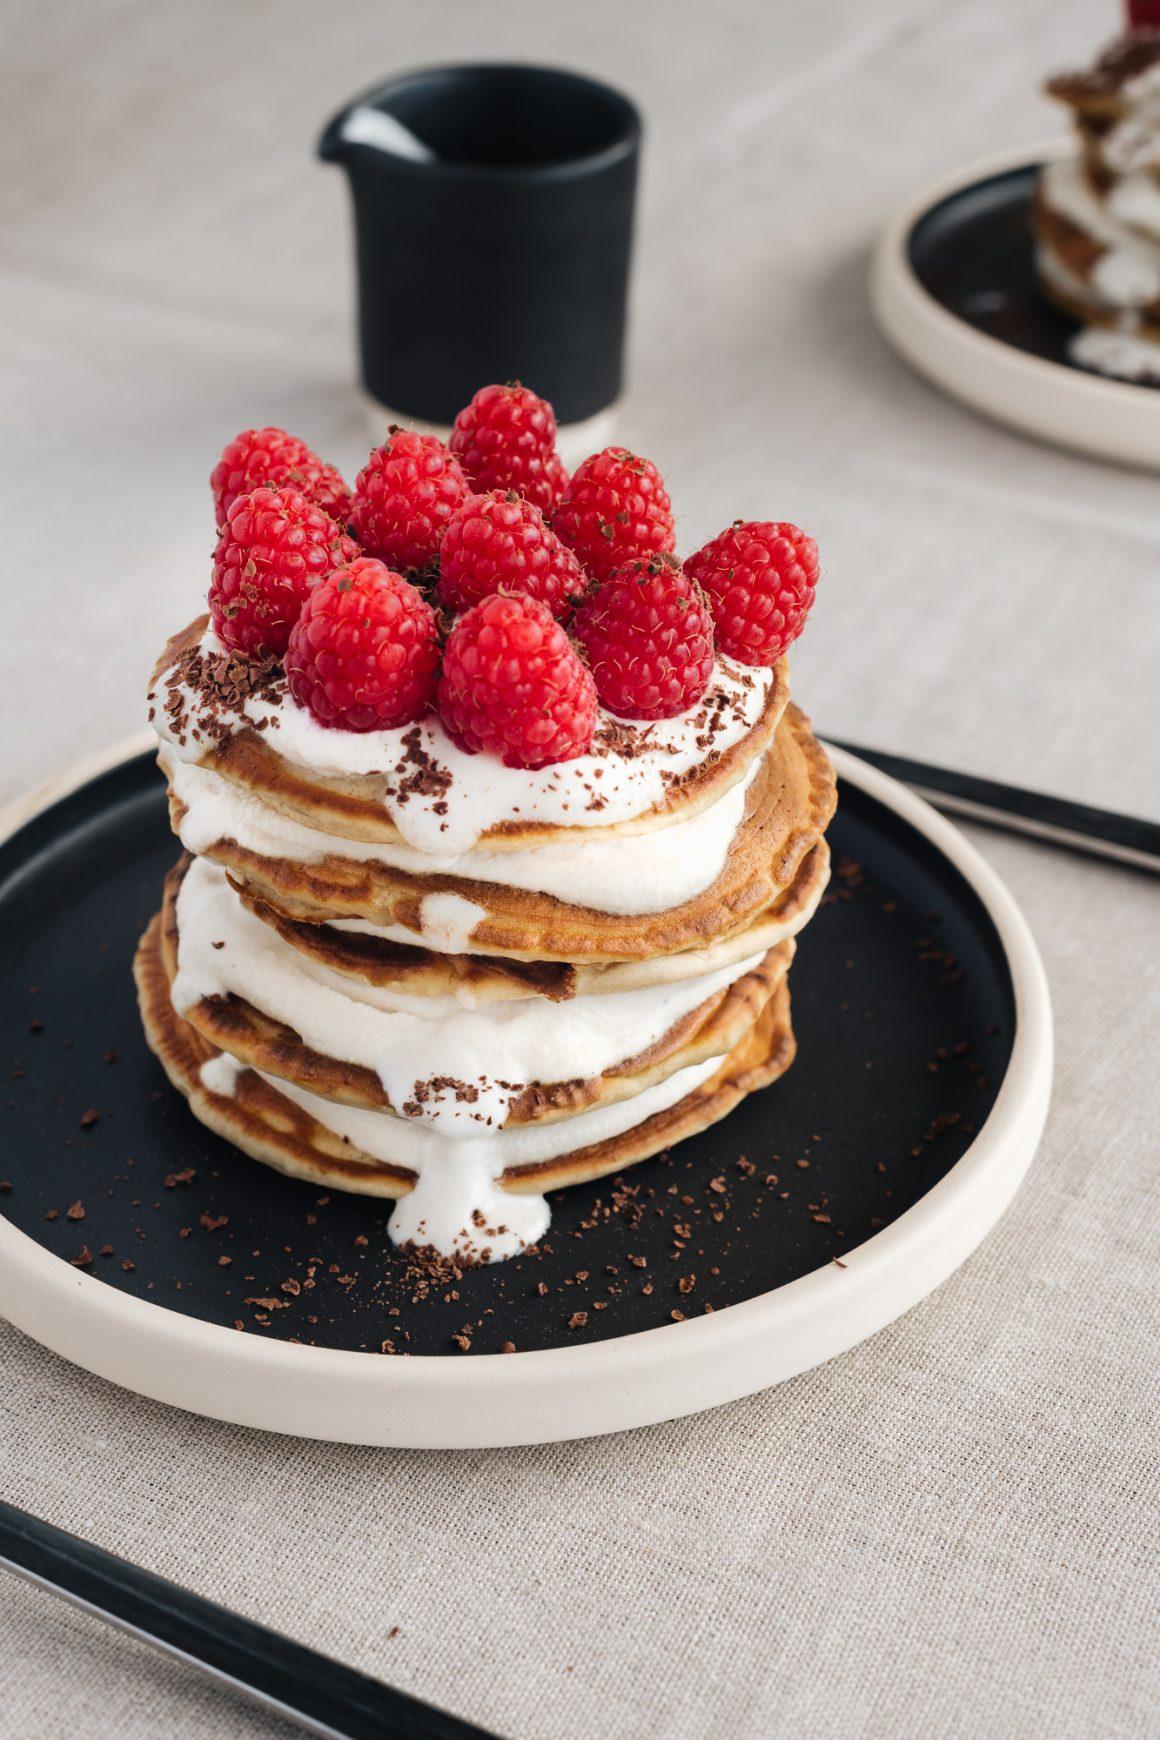 dsc 4839 2 1160x1740 - Gluten Free Fluffy Pancakes